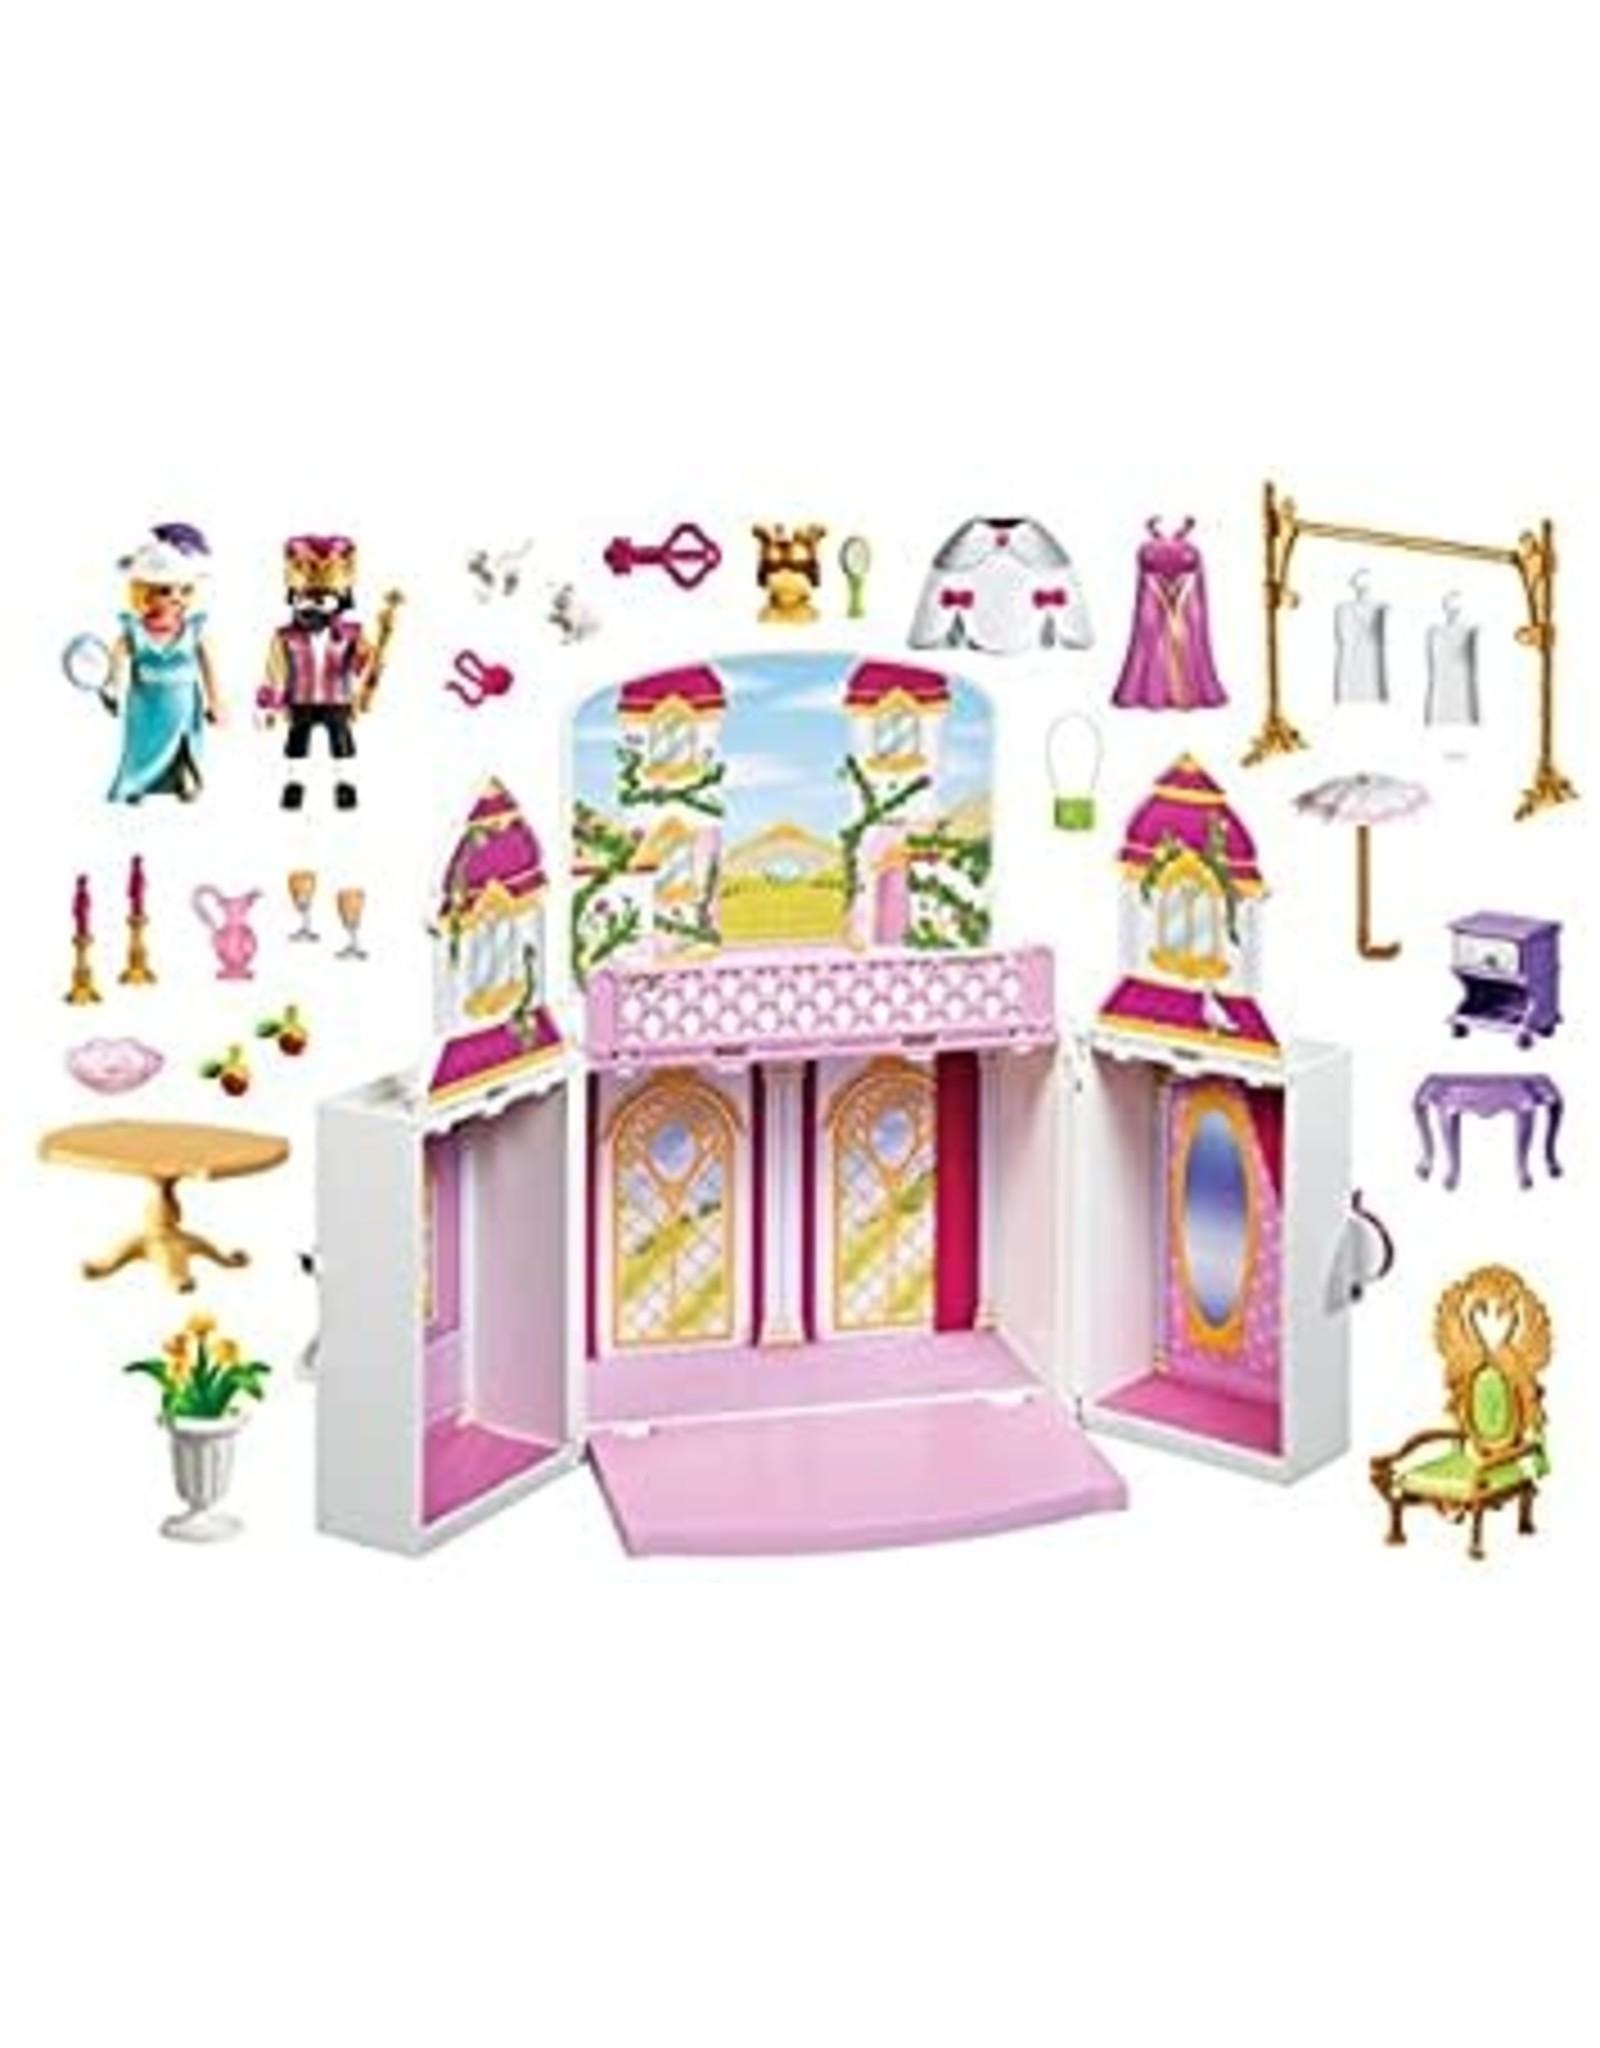 Playmobil My Secret Royal Palace Play Box